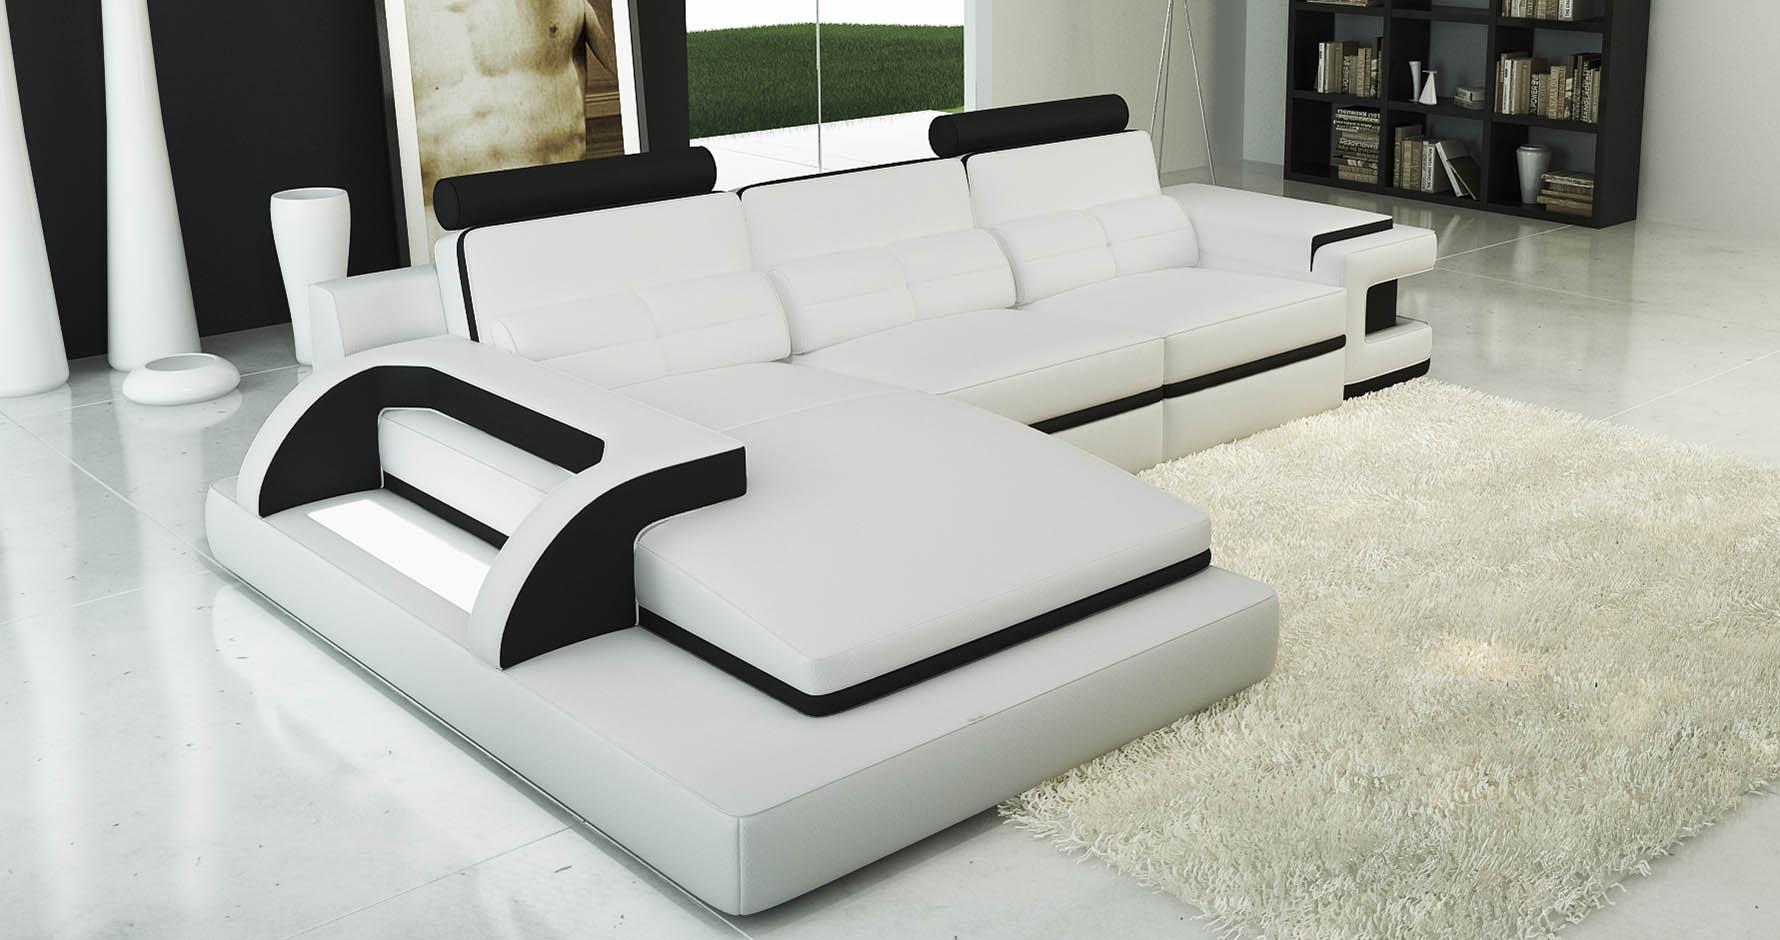 78 beau image de canap convertible cocktail scandinave. Black Bedroom Furniture Sets. Home Design Ideas